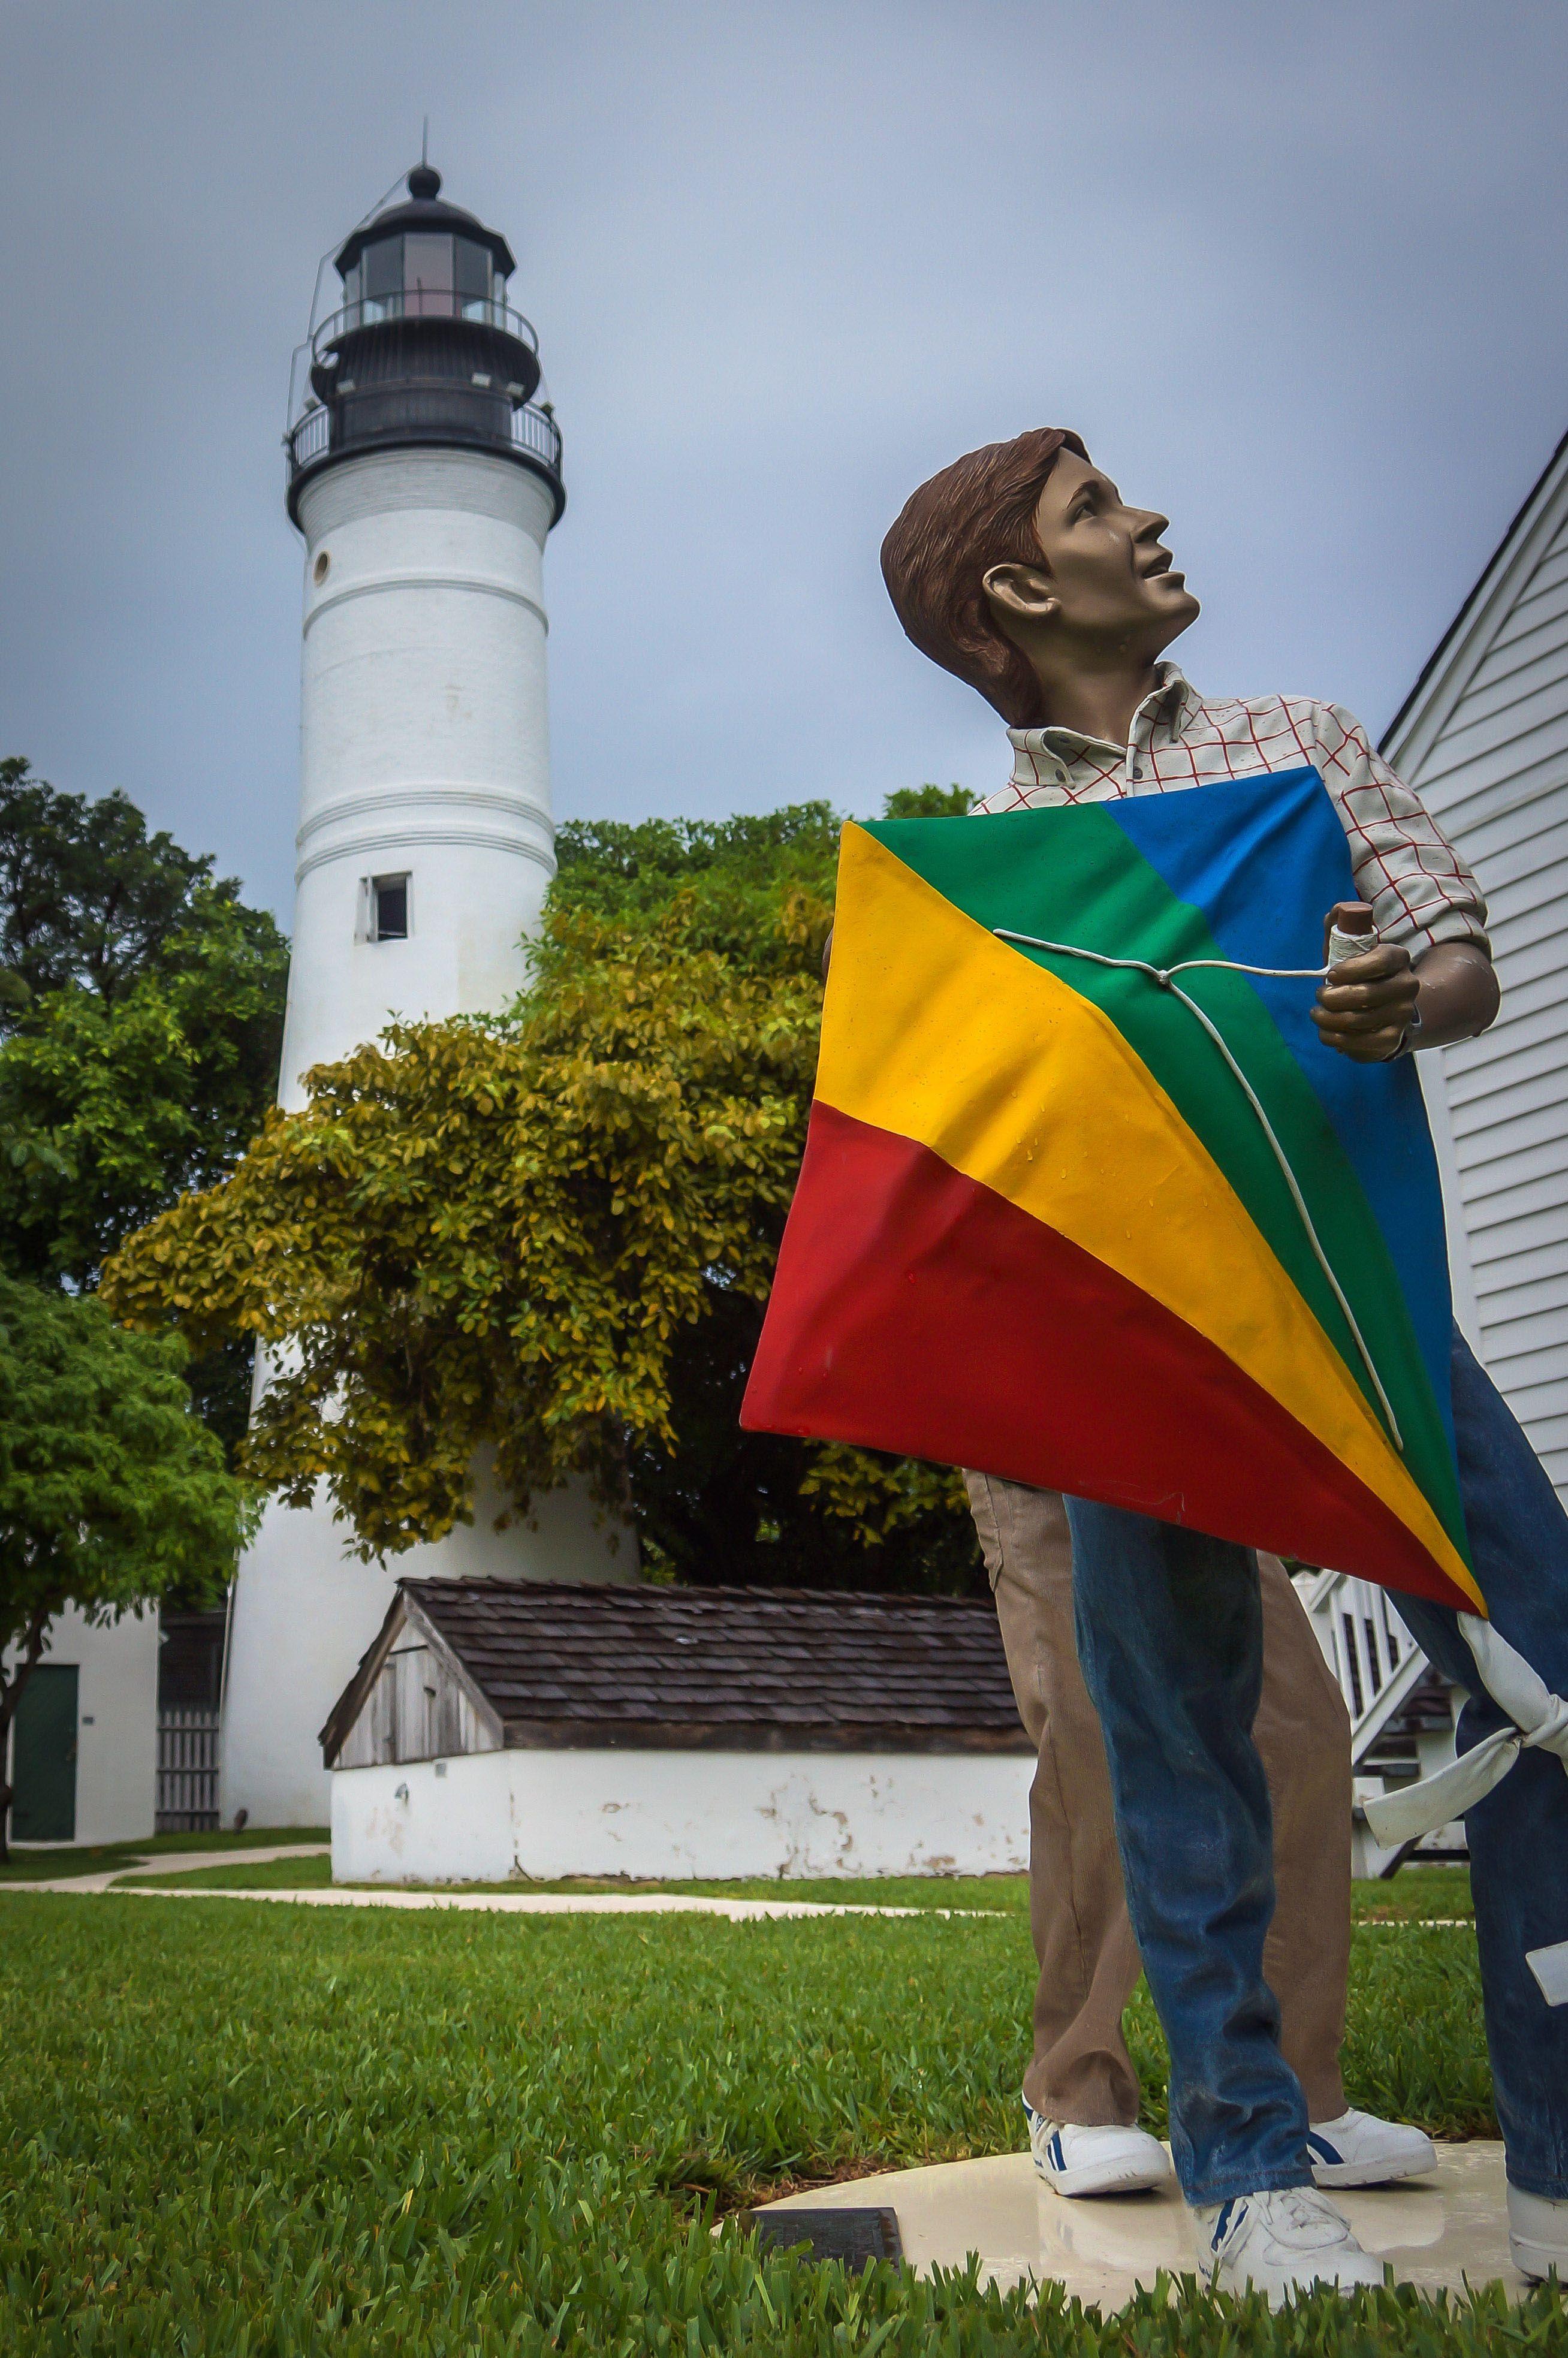 Key West Lighthouse - Key West, FL